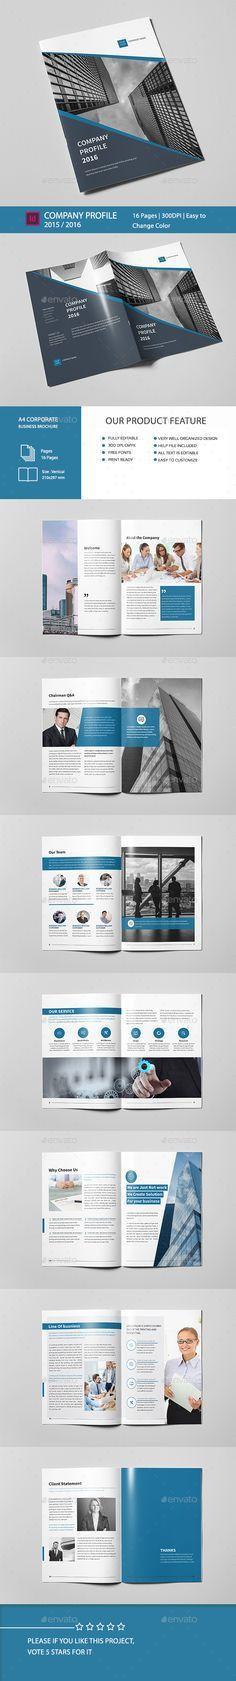 Creative Company Profile Brochure Template | Brochure & Flyer ...